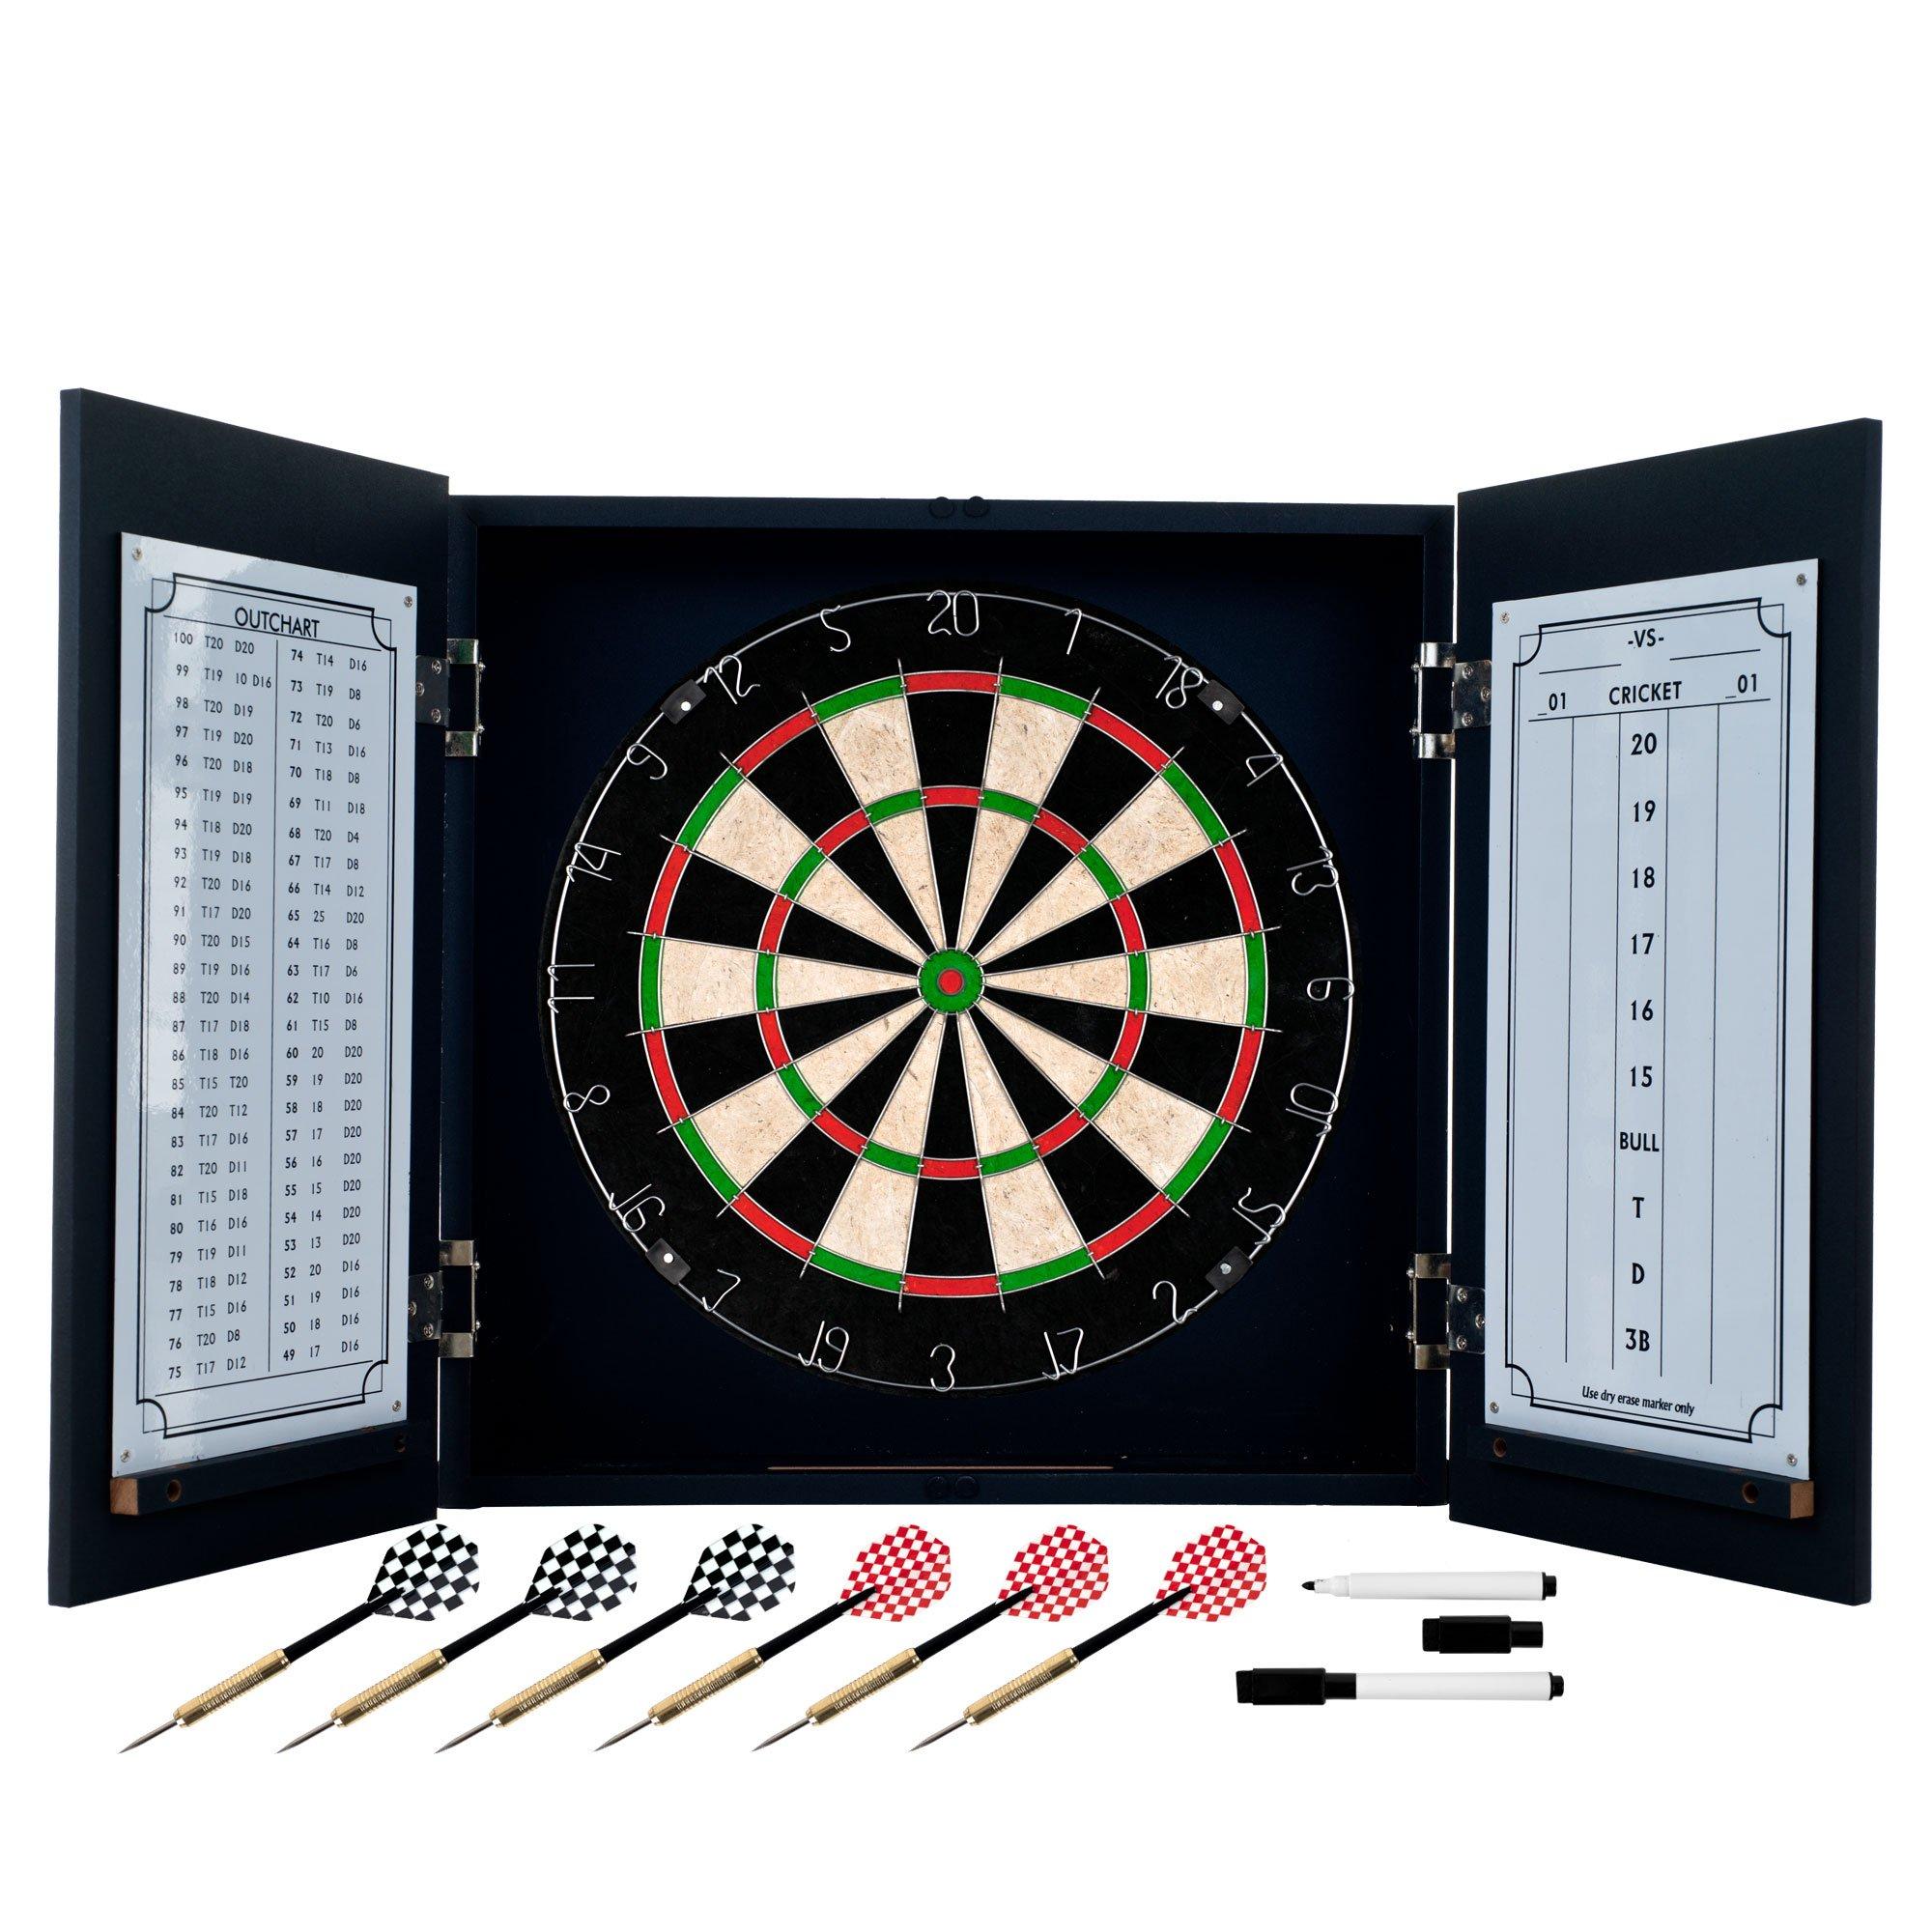 TG Laminate Dart Cabinet Set (Black, 3.5 x 19.5 x 20-Inch)